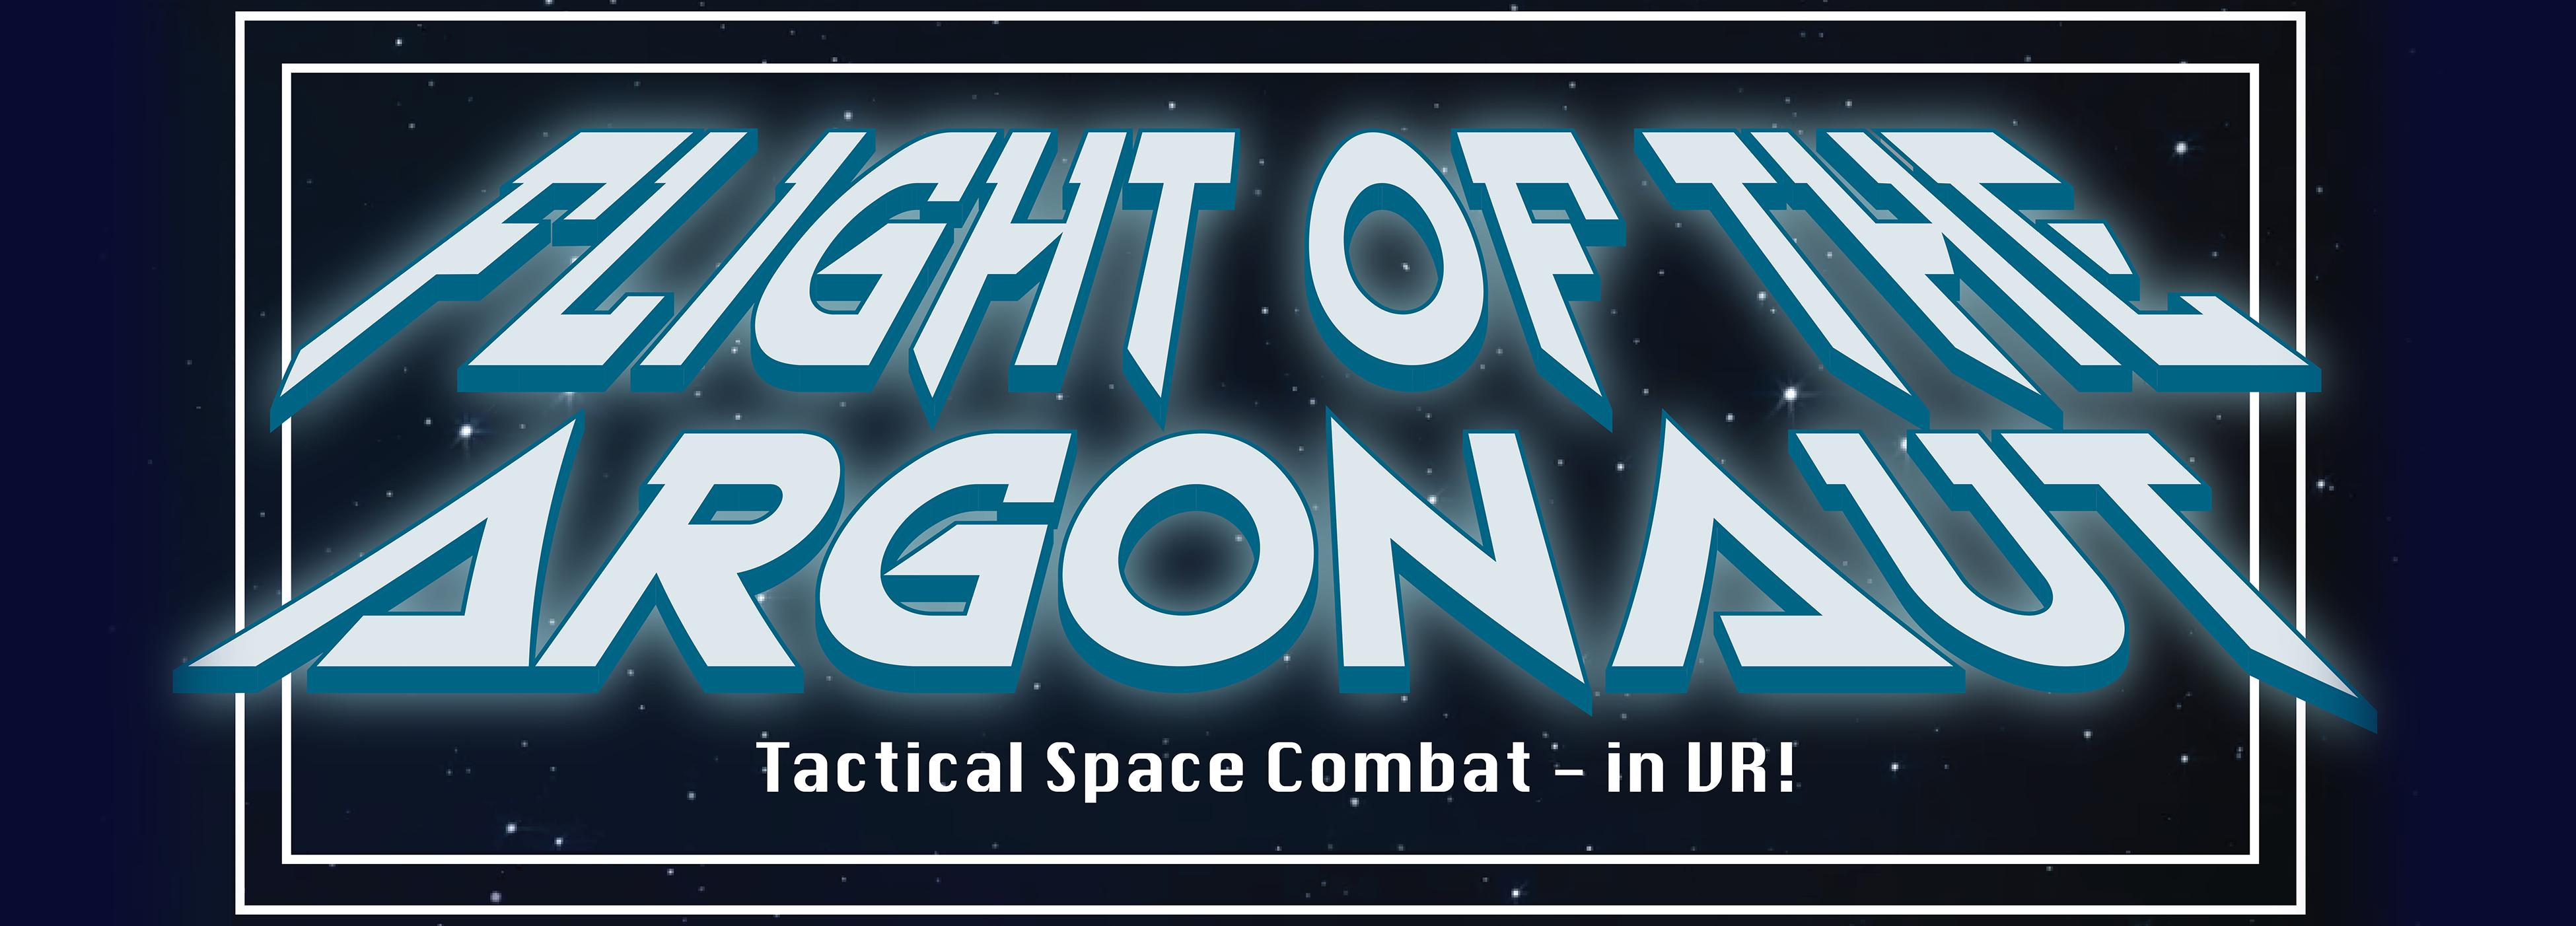 Flight of the Argonaut